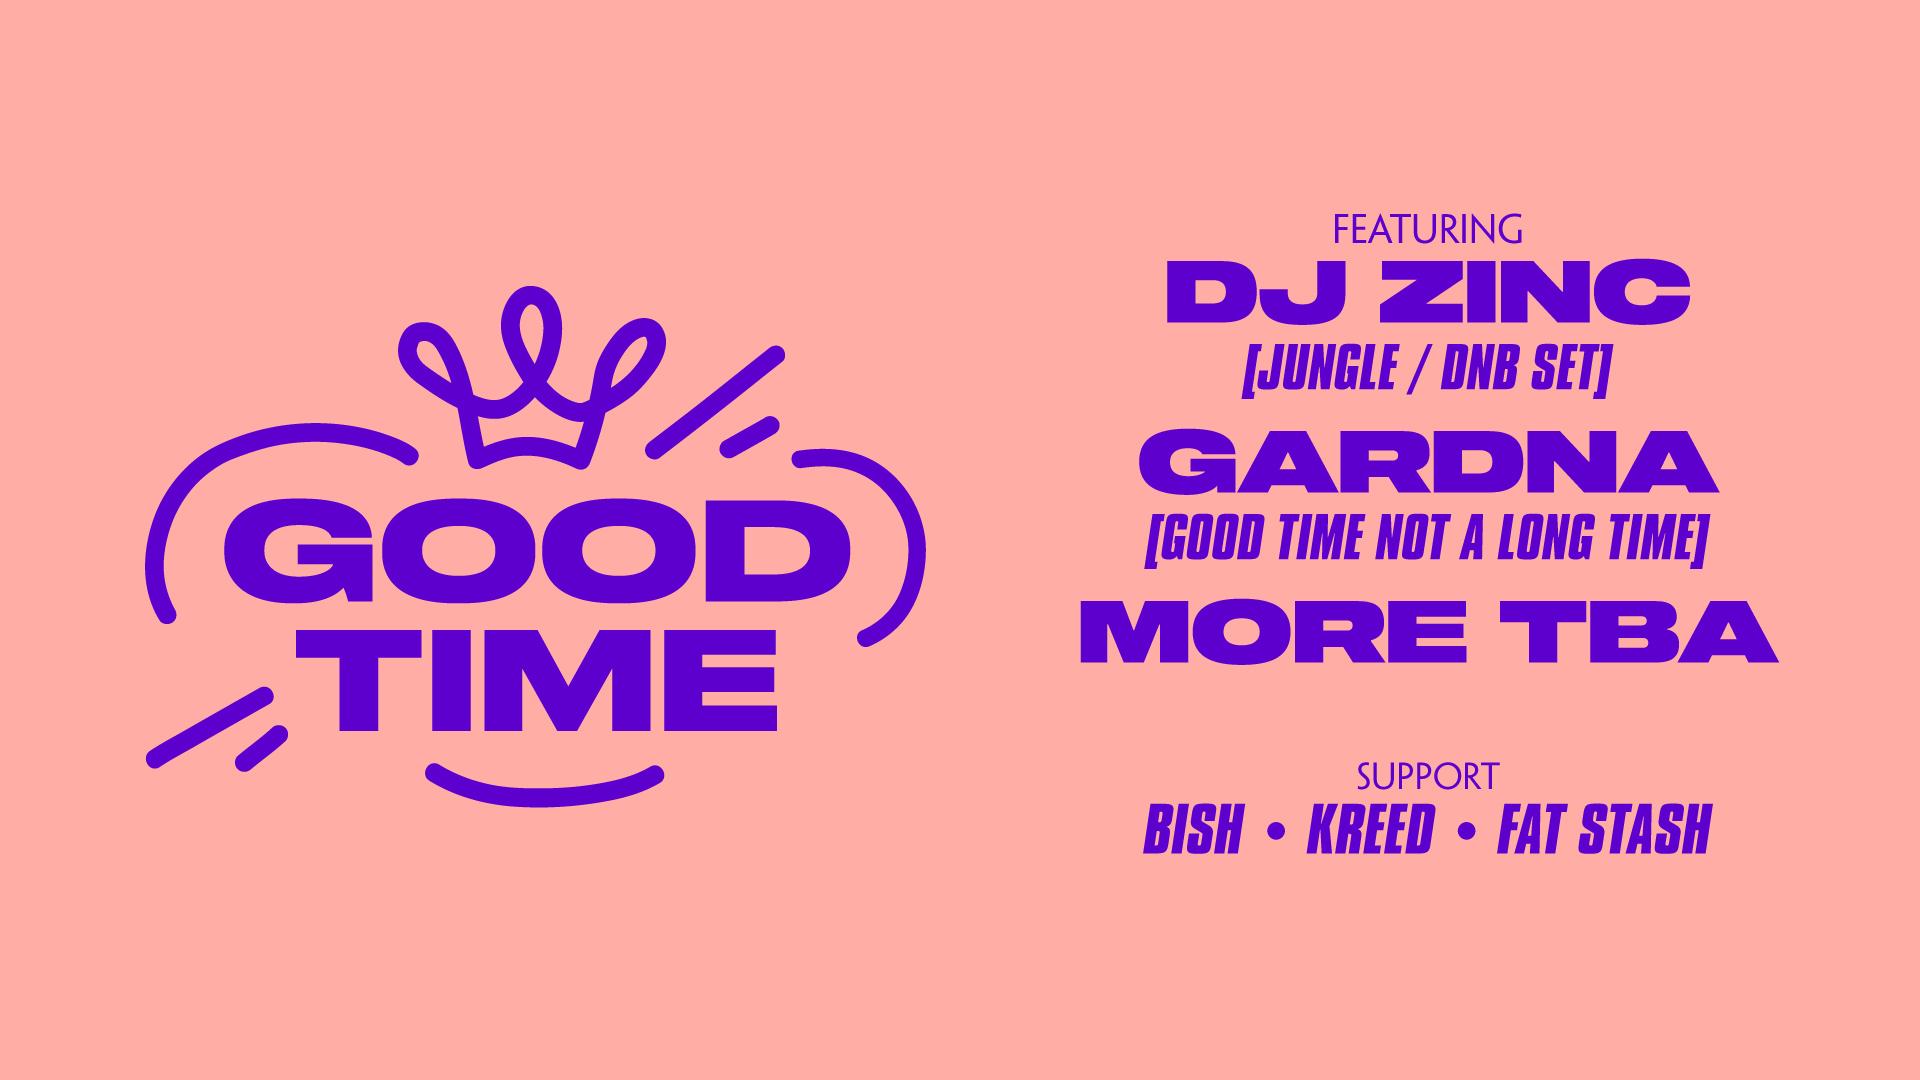 Good Time DJ Zing Gardna Thekla Brisotl